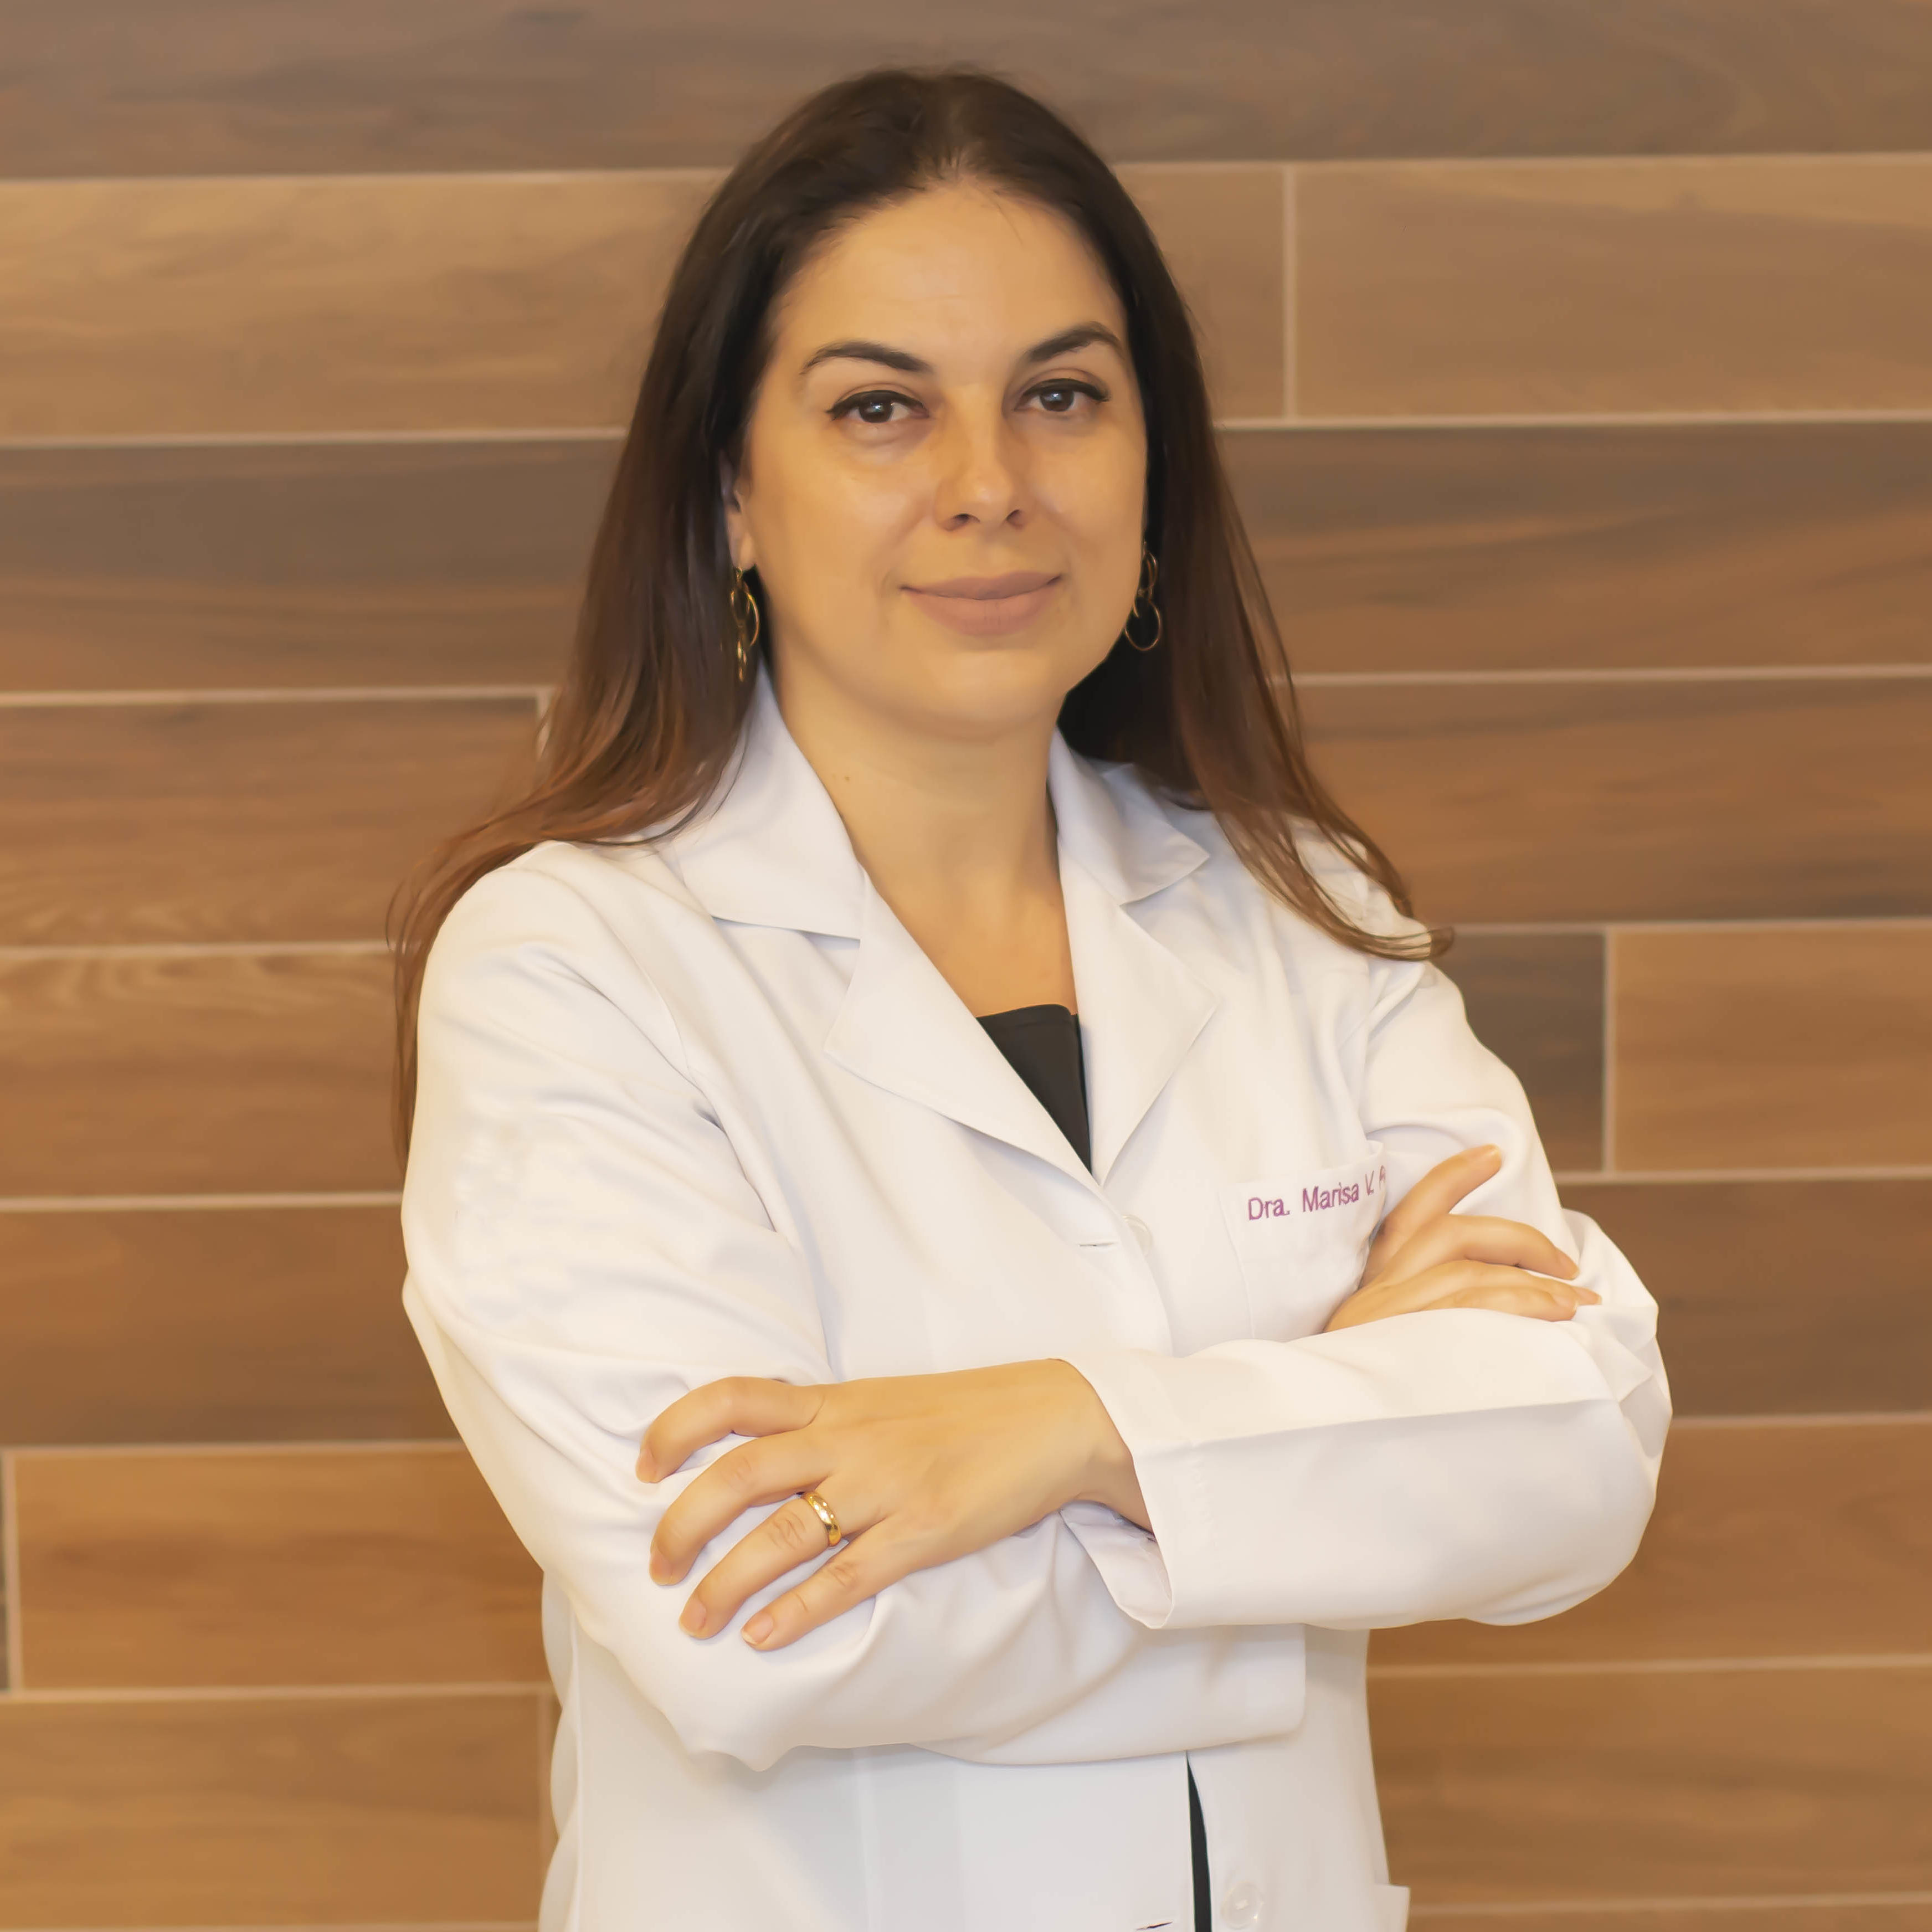 Dra. Marisa Vieira Frederico